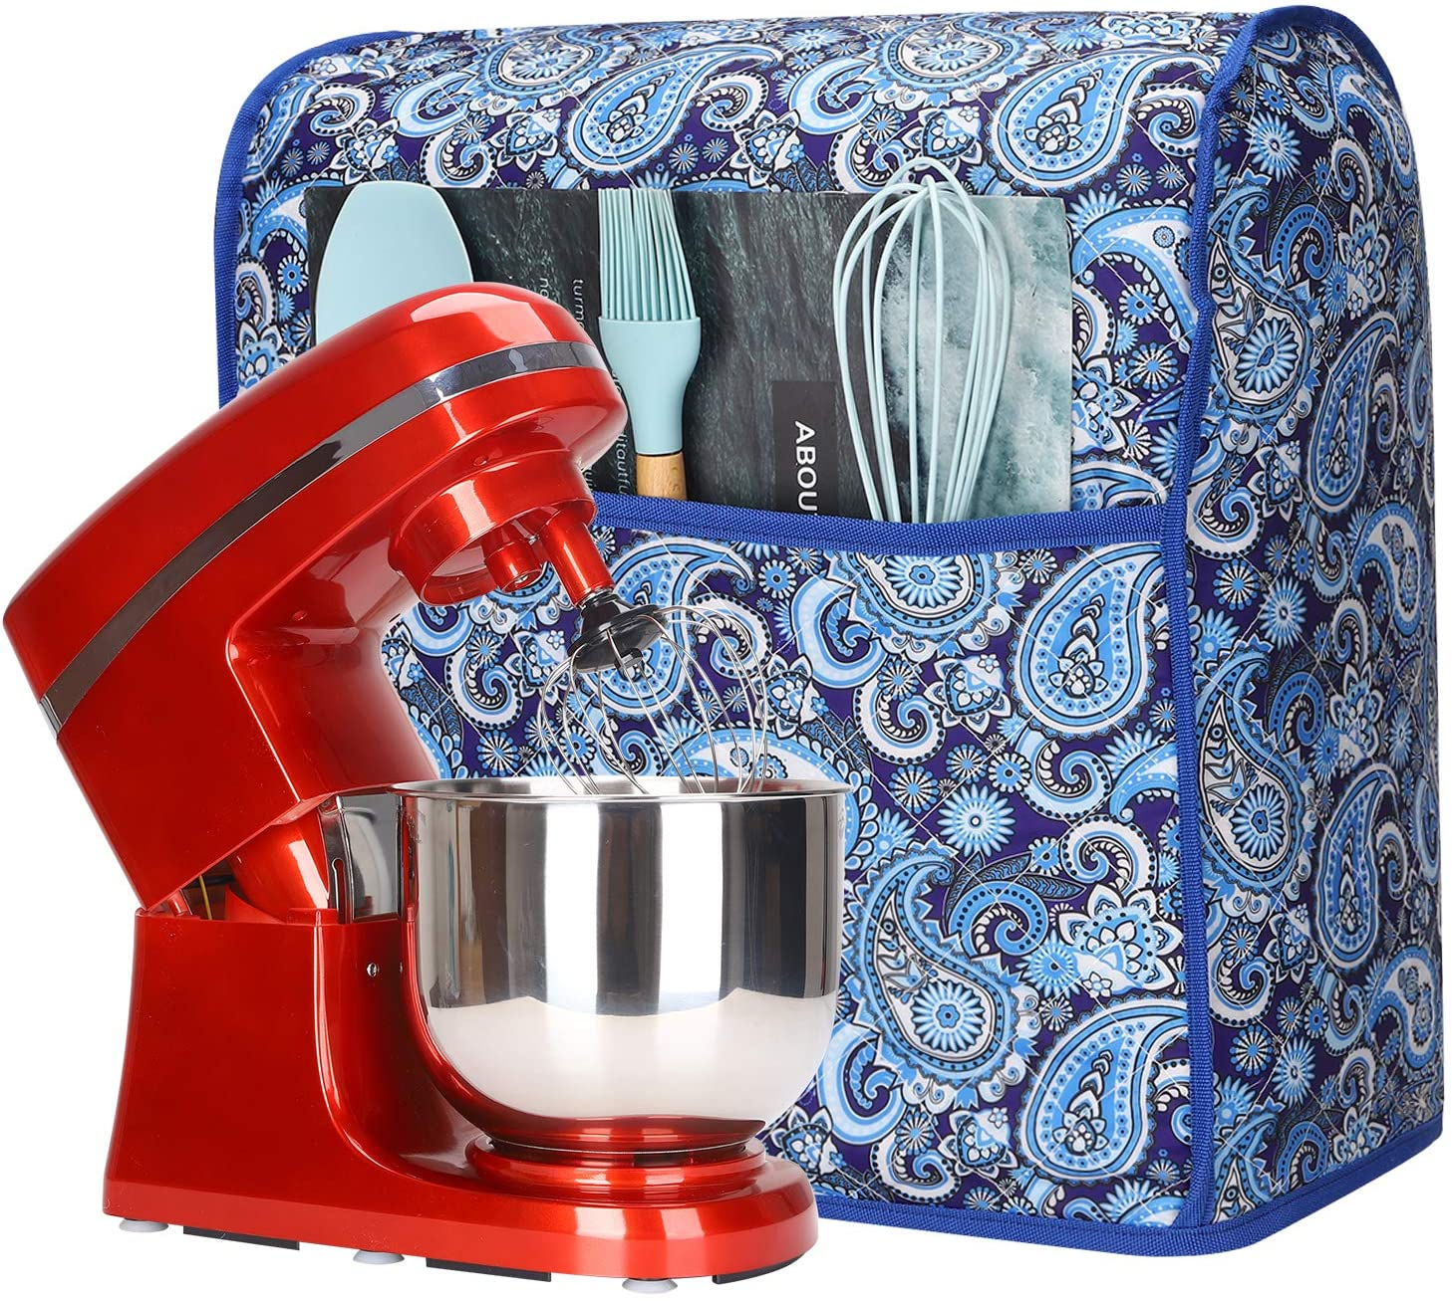 Amazon Com Kitchen Aid Mixer Cover Stand Dust For Kitchenaid Hamilton Sunbeam Mixers Small Appliances With Pockets Compatible All 6 8 Quart Tilt Head Bowl Lift Models